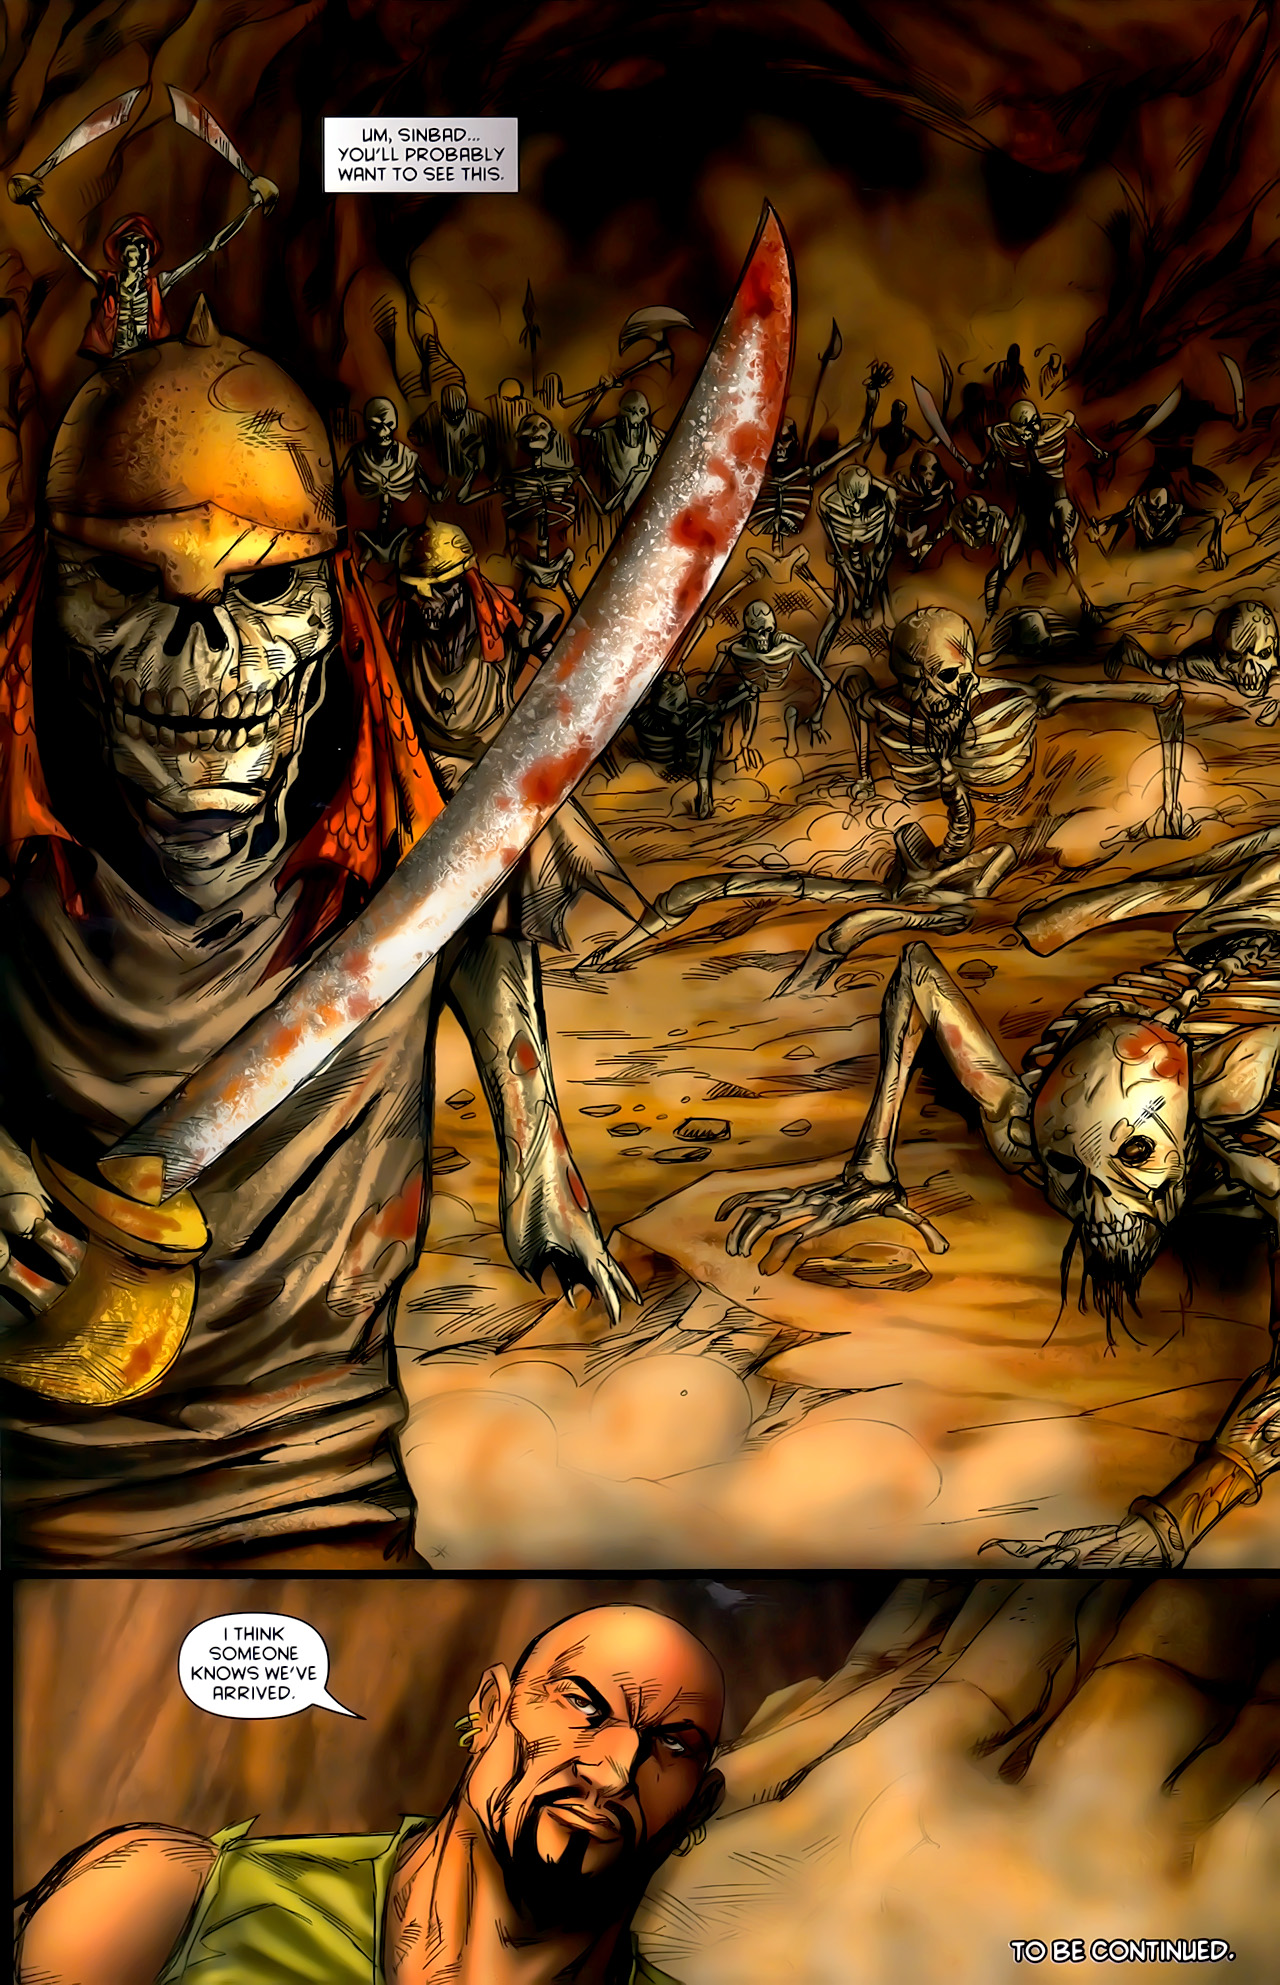 Read online 1001 Arabian Nights: The Adventures of Sinbad comic -  Issue #10 - 24